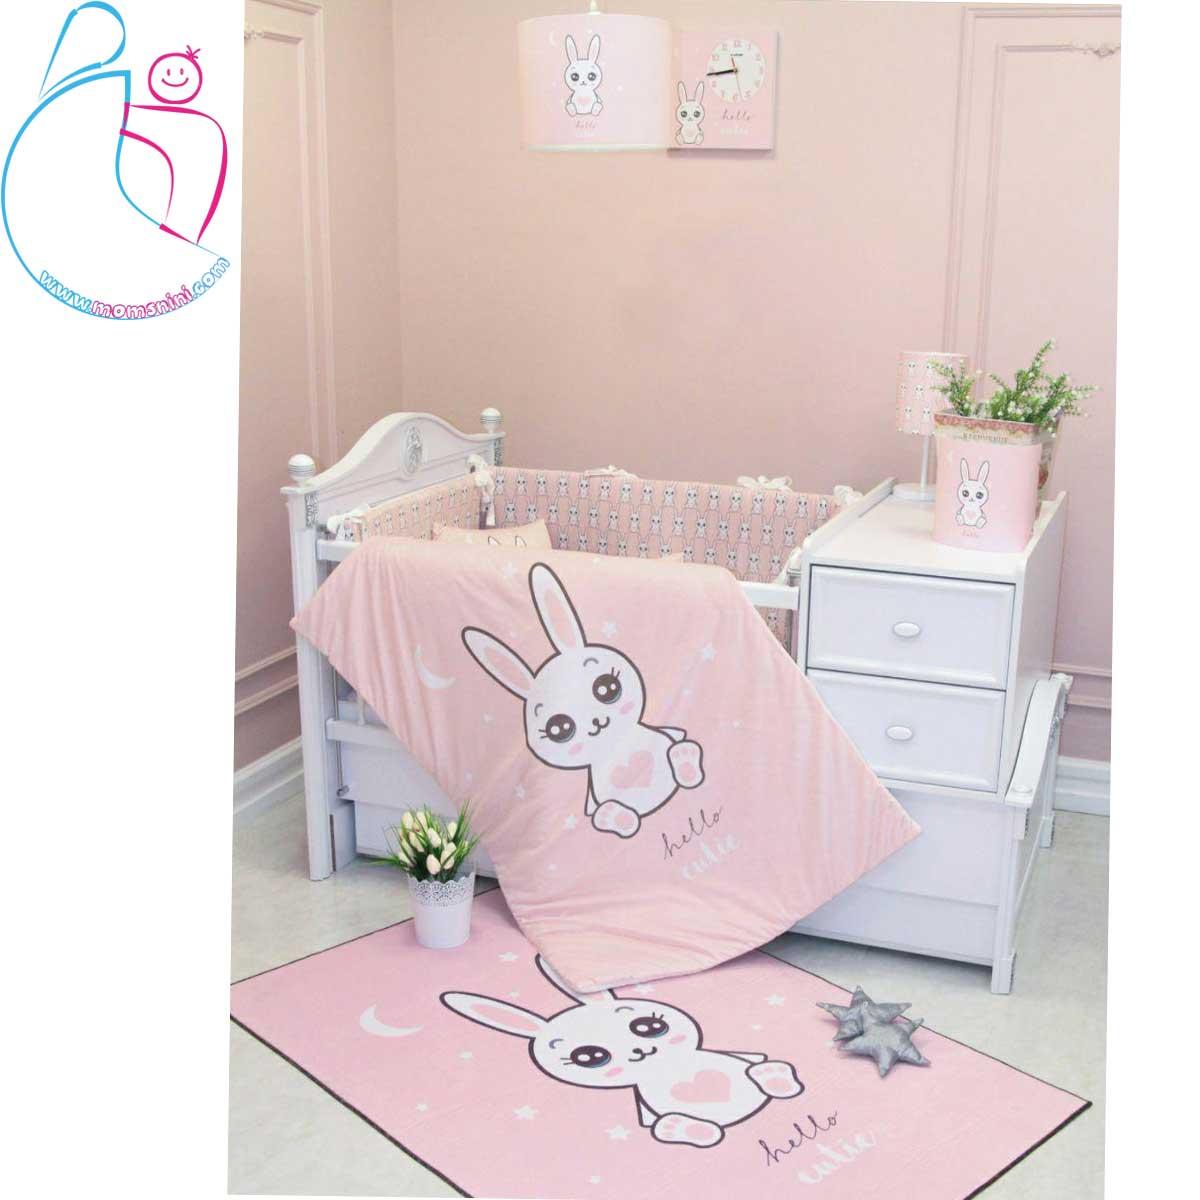 ست کامل اتاق کودک طرح خرگوش لوس